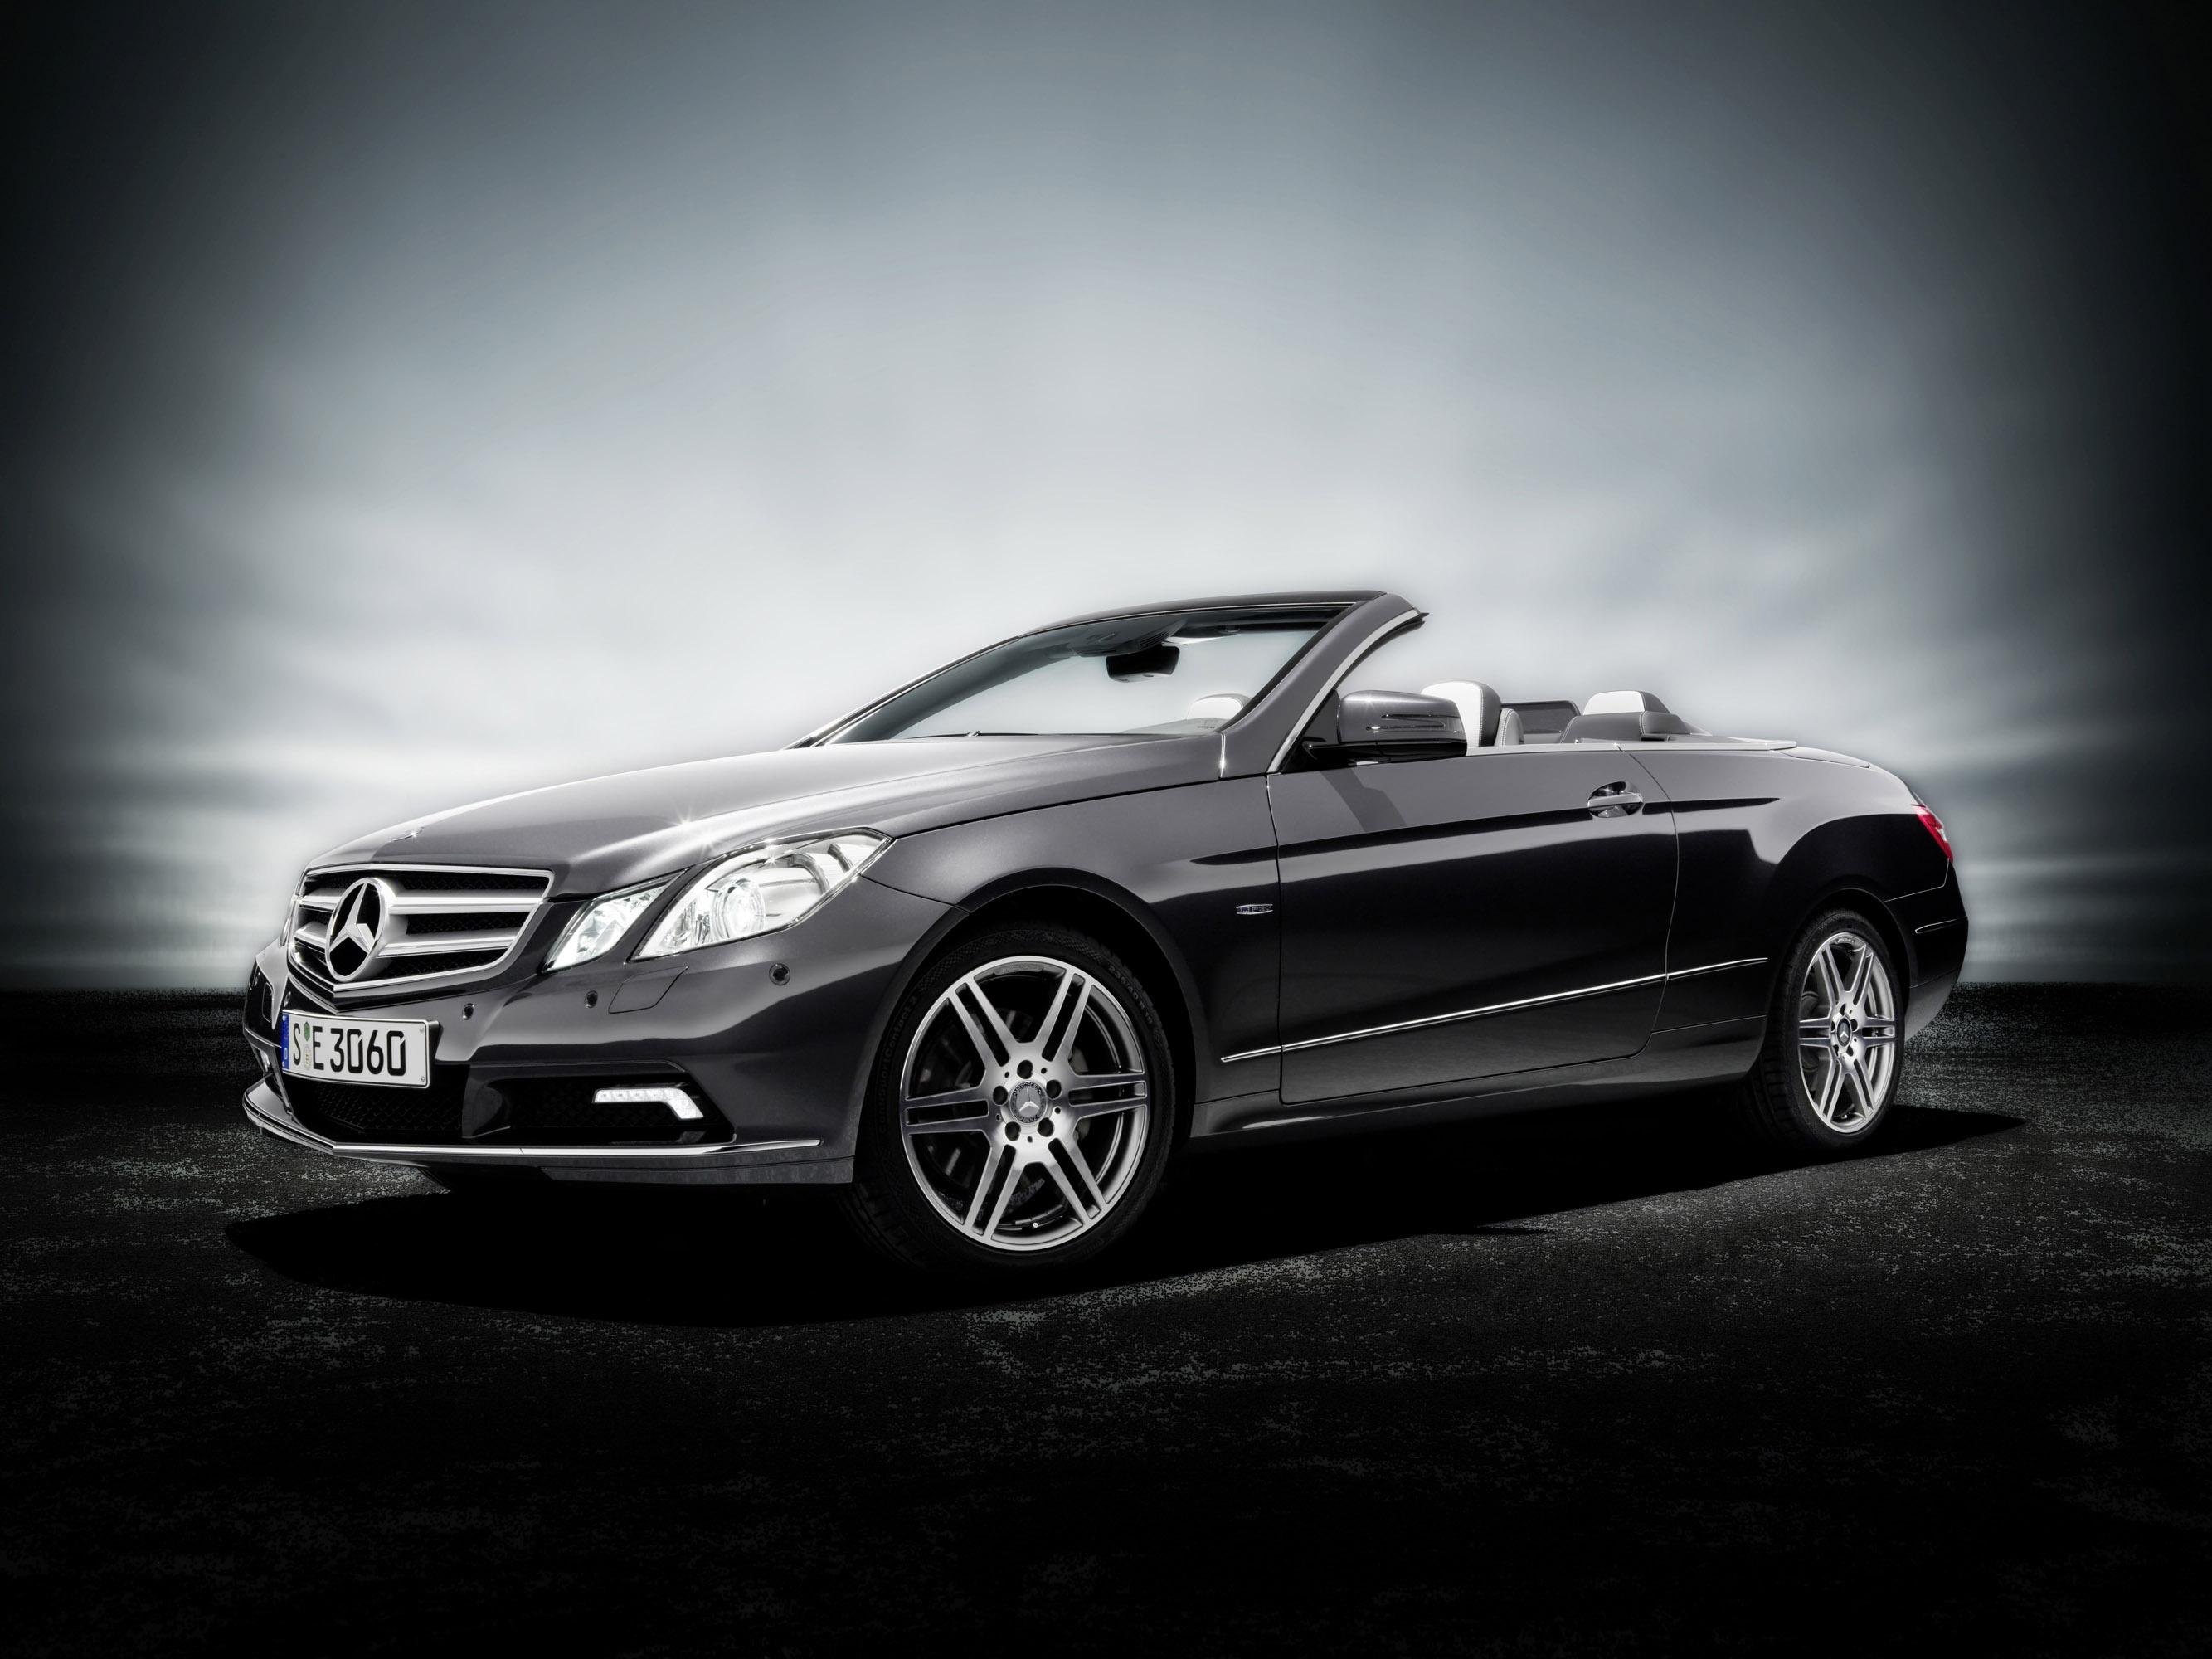 Mercedes-Benz E-Class Cabriolet photo #1